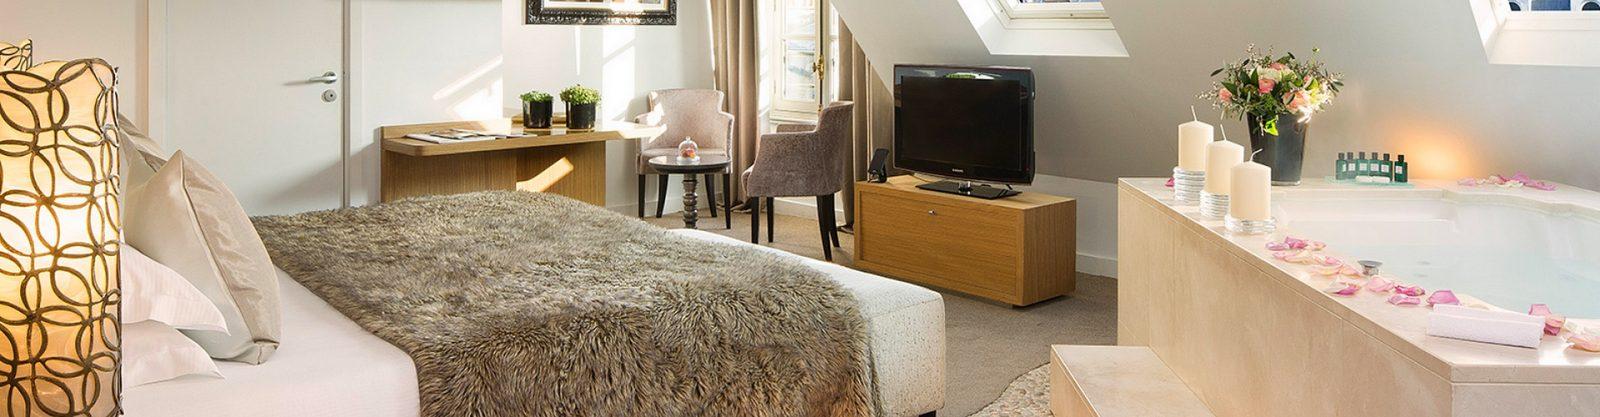 header hotel privatif paris lumen paris louvre